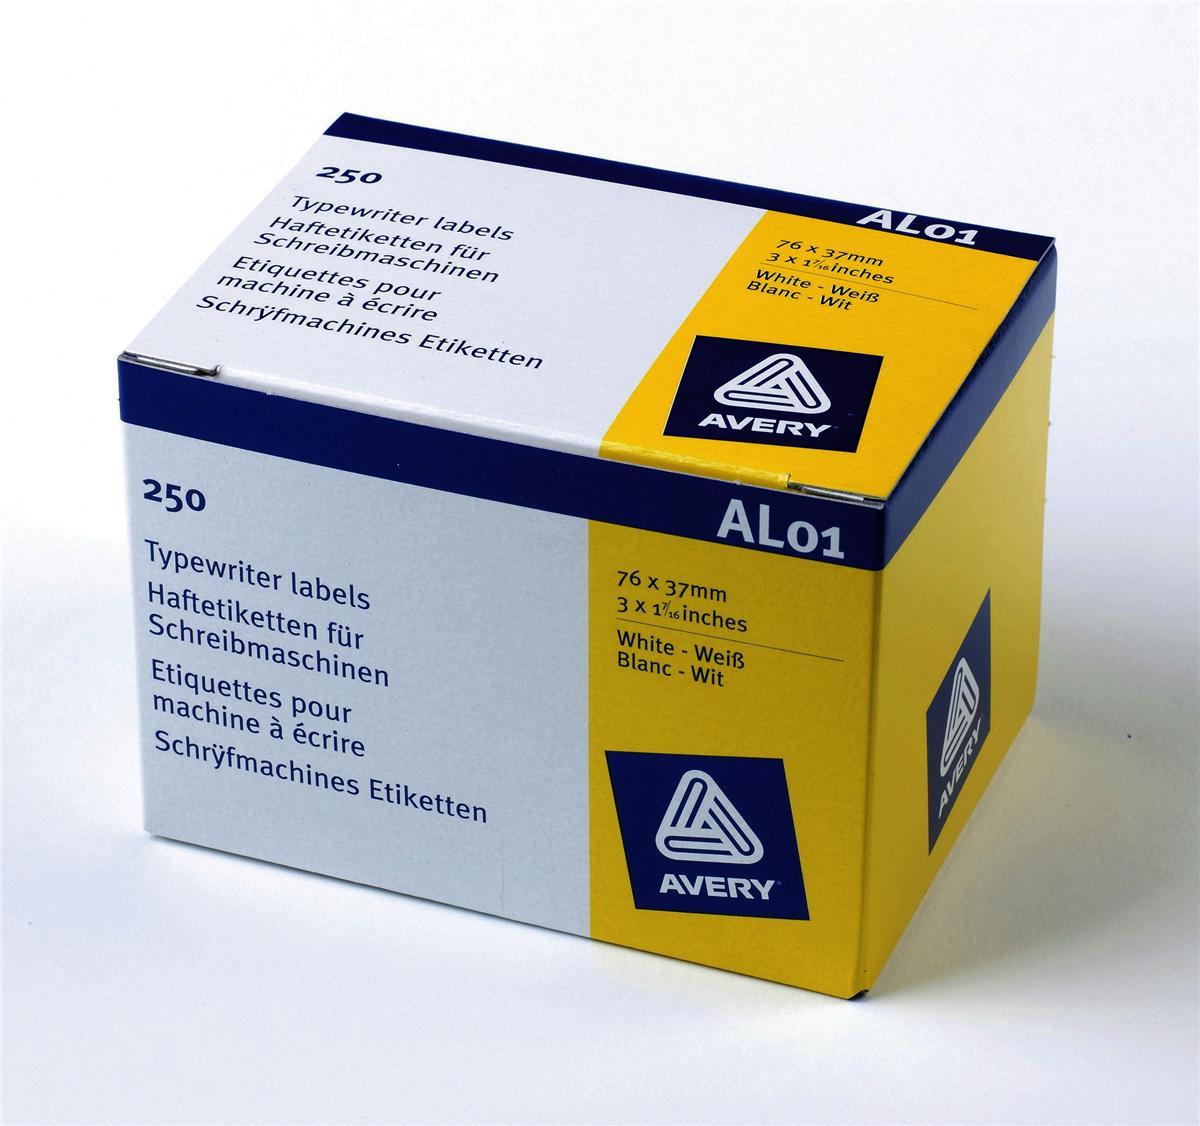 Avery Address Labels Roll 76x37mm Ref AL01 [250 Labels]